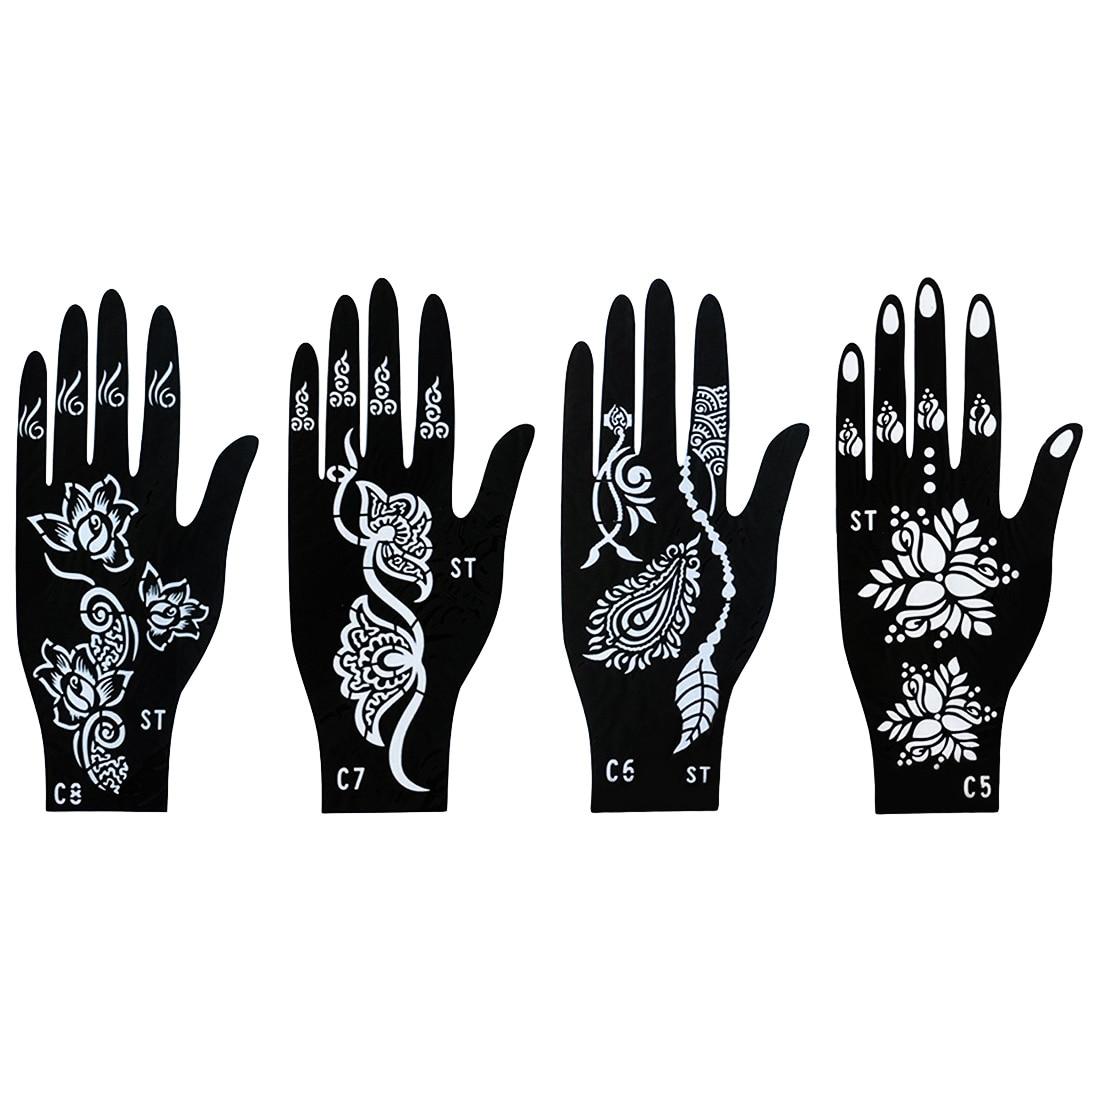 India Nepal Henna tatuaje Palma plantilla flor encaje dedo cubierta molde Flash PISTOLA DE PULVERIZACIÓN mujer mano pintura Mehndi Plantilla de tatuaje